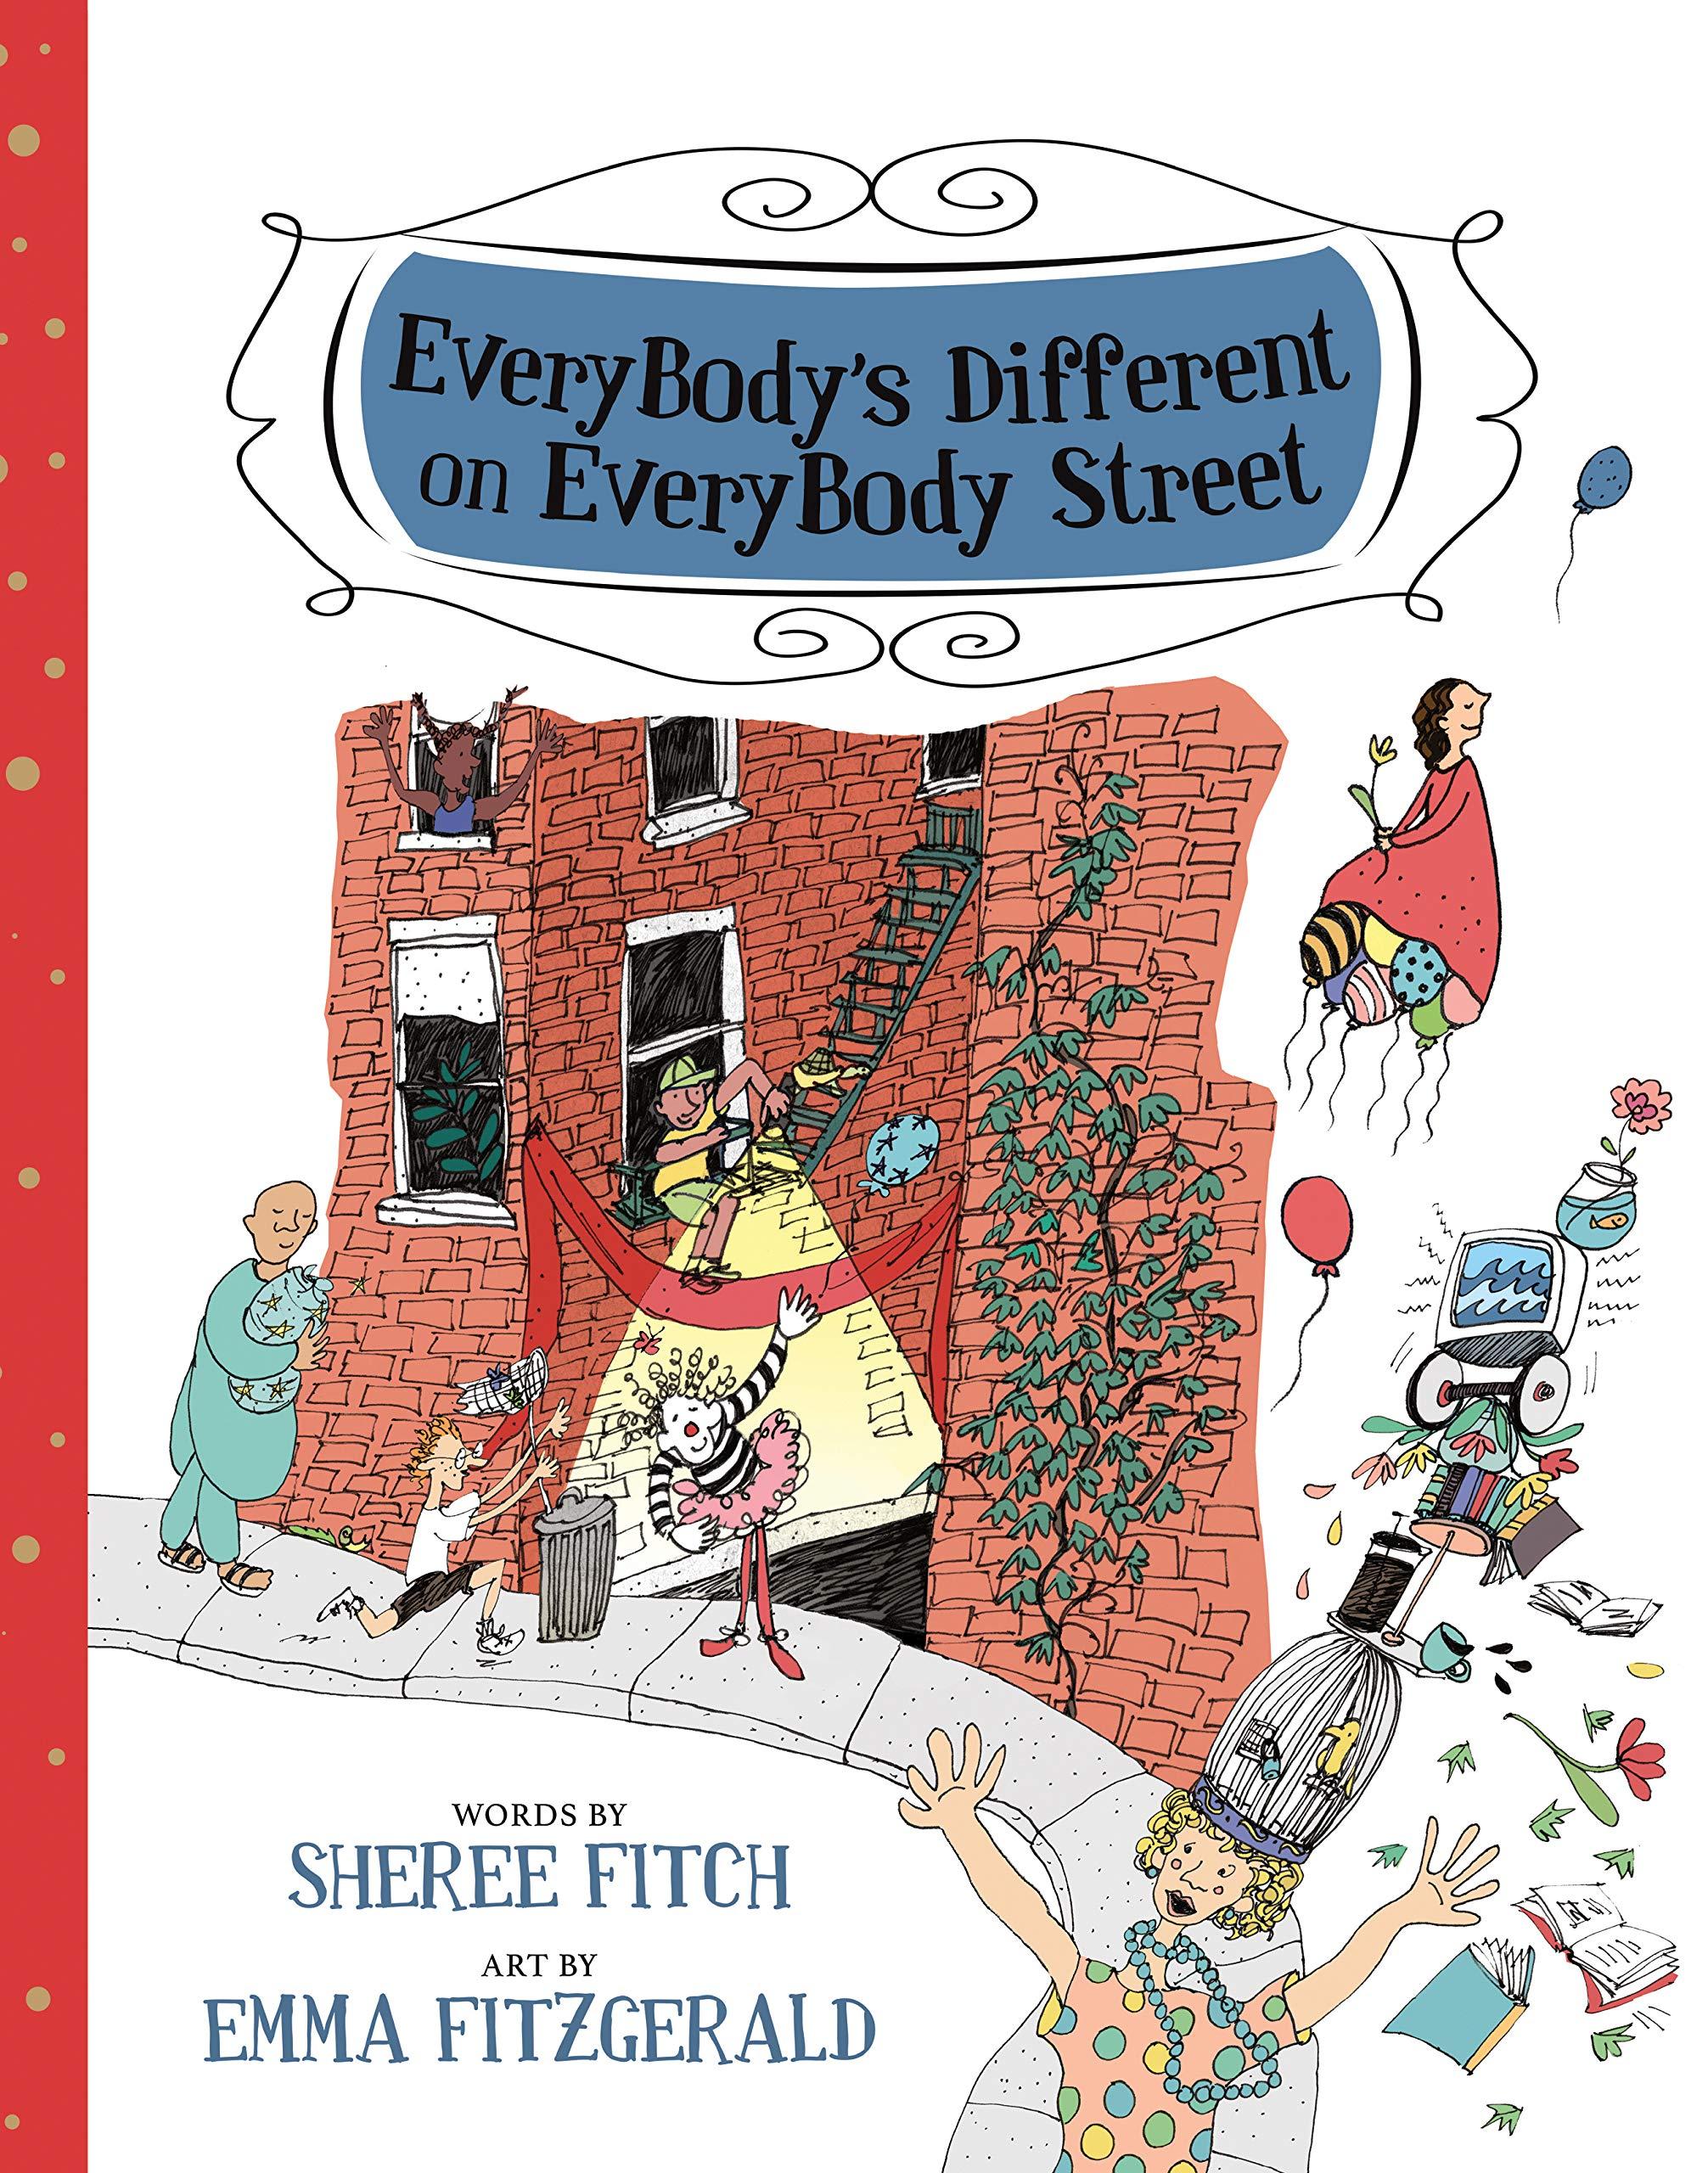 EveryBodys Different on EveryBody Street